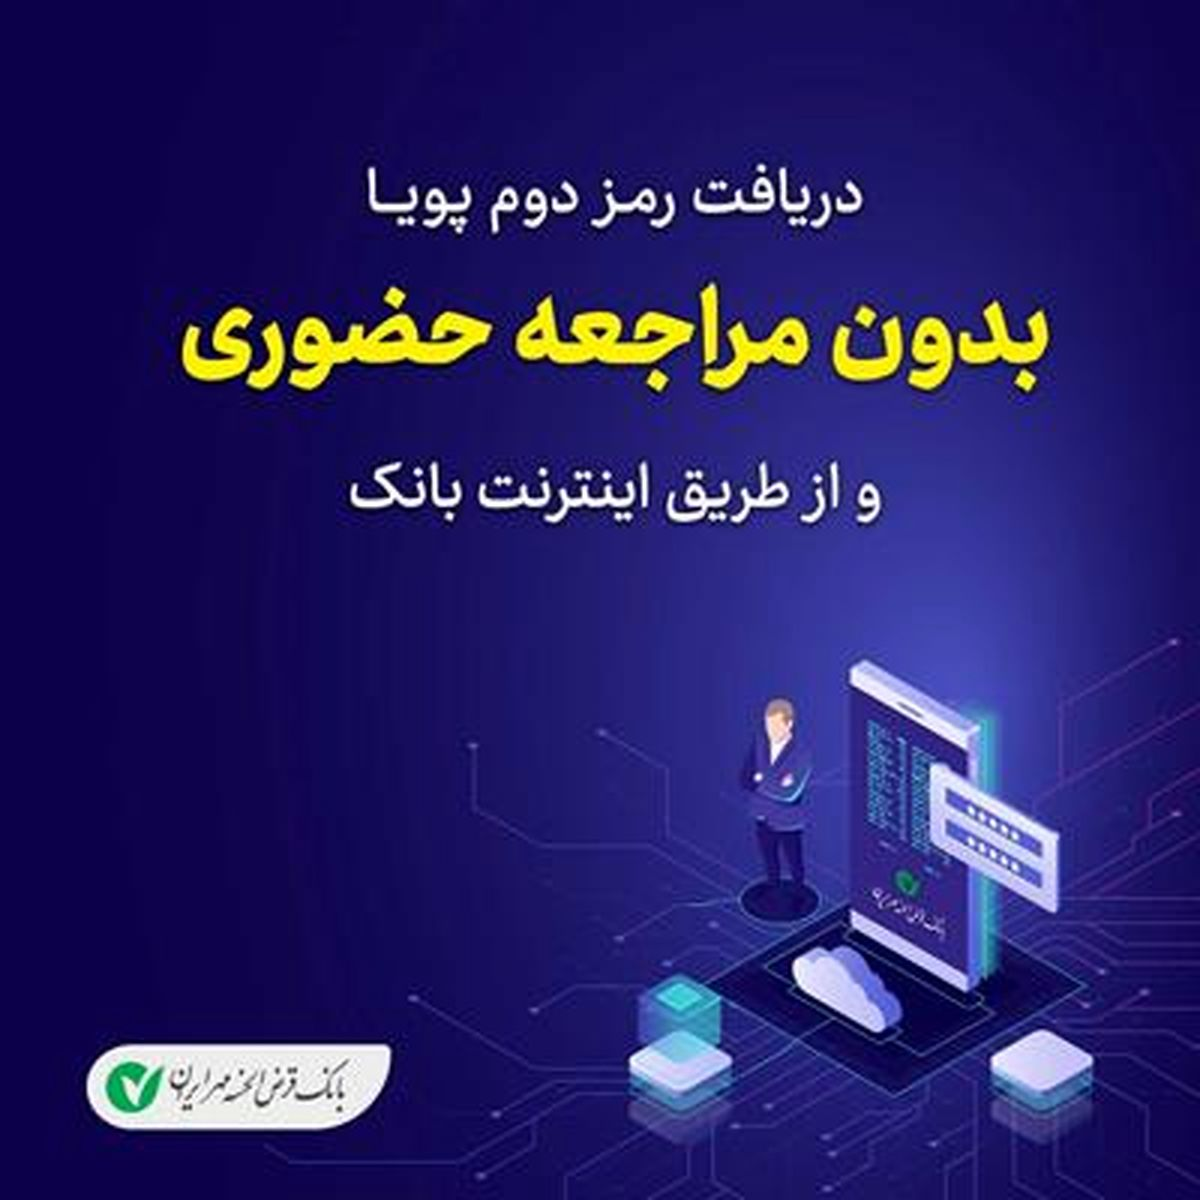 نحوه فعالسازی غیر حضوری رمز دوم پویا بانک قرض الحسنه مهر ایران